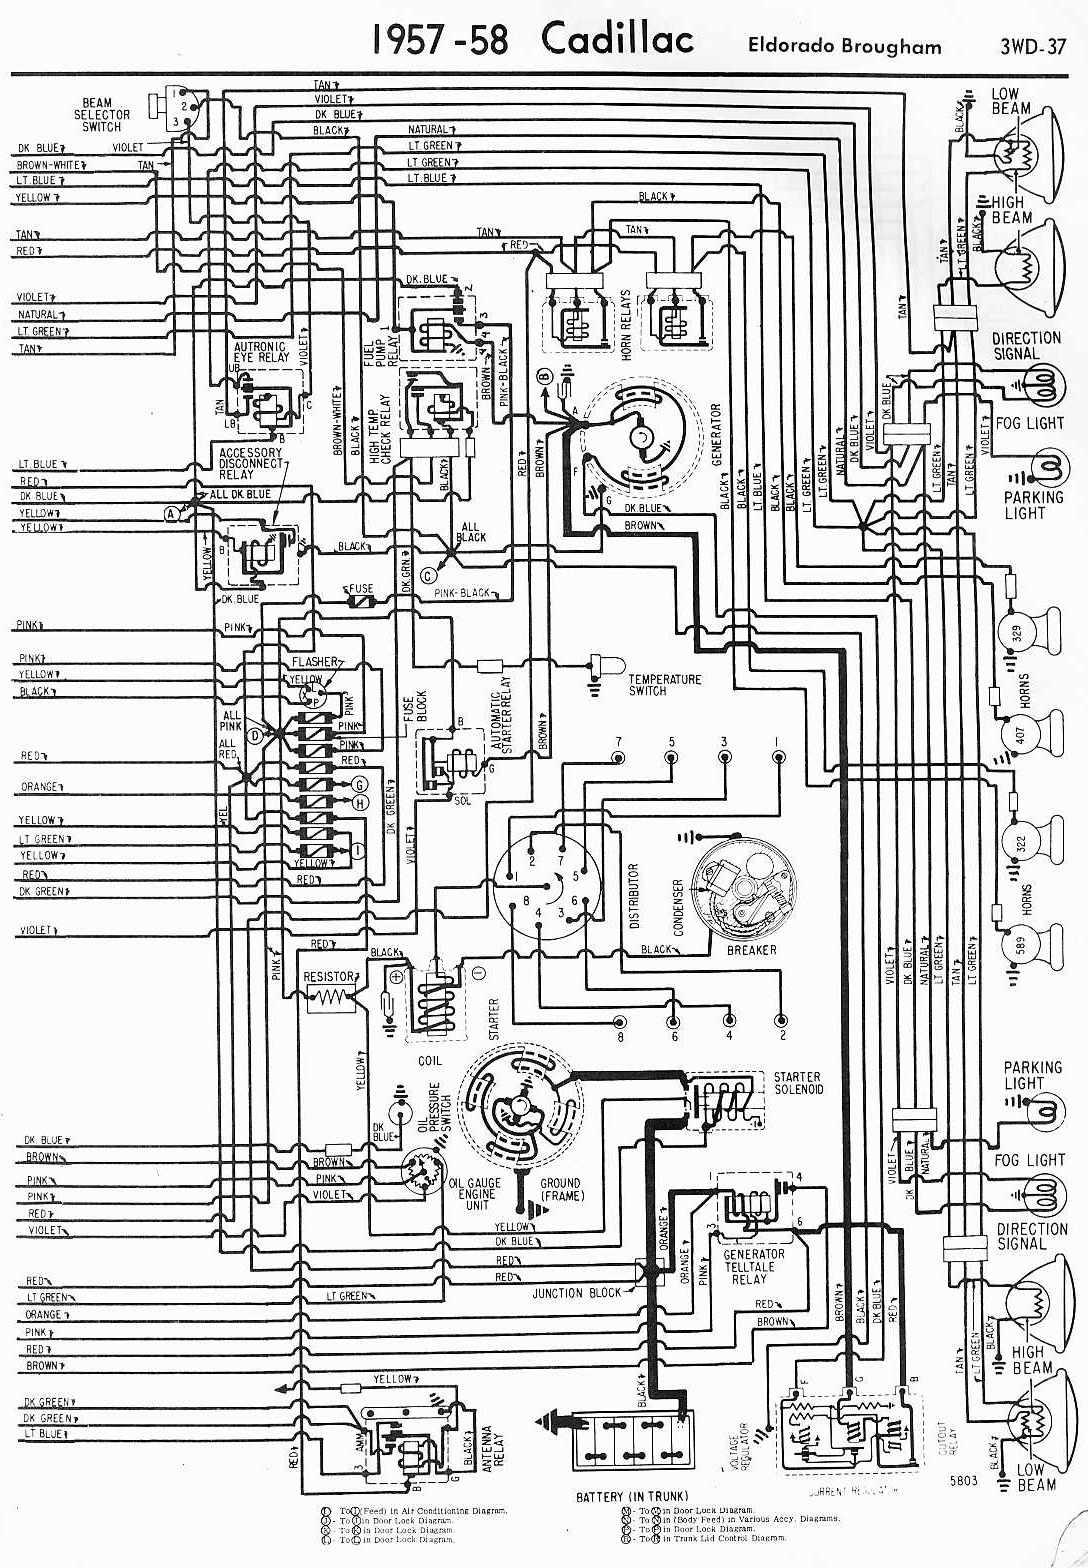 1961 cadillac distributor wiring electrical wiring diagrams rh cytrus co 1962 Cadillac Wiring Cadillac DeVille Wiring-Diagram